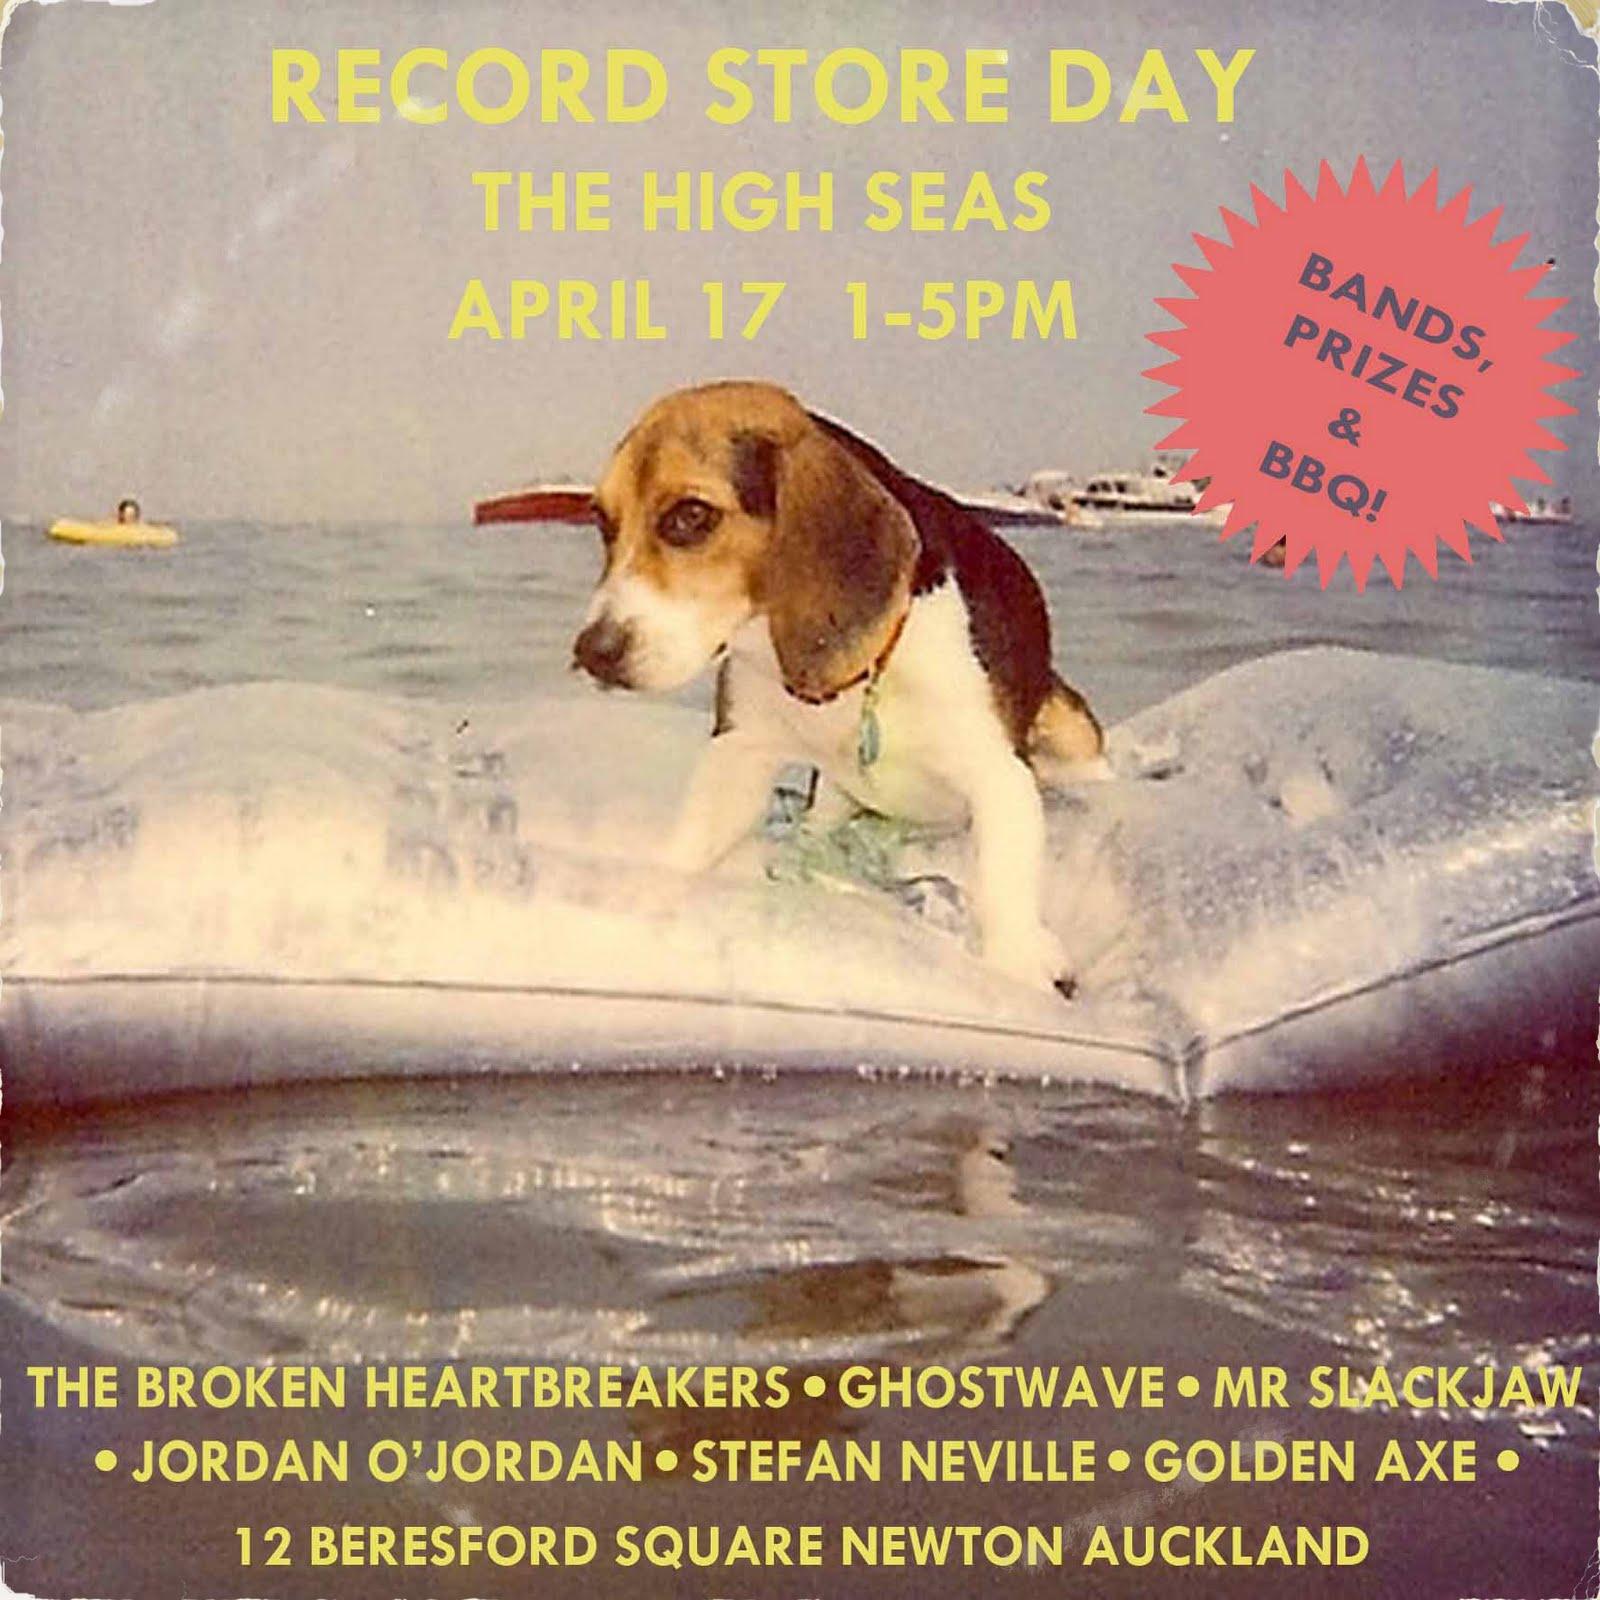 http://3.bp.blogspot.com/_jD0YZ5rI3o0/S7Qwy8OtgYI/AAAAAAAAAOE/jMSOwr38KGk/s1600/Record+store+day+distress+sq.jpg